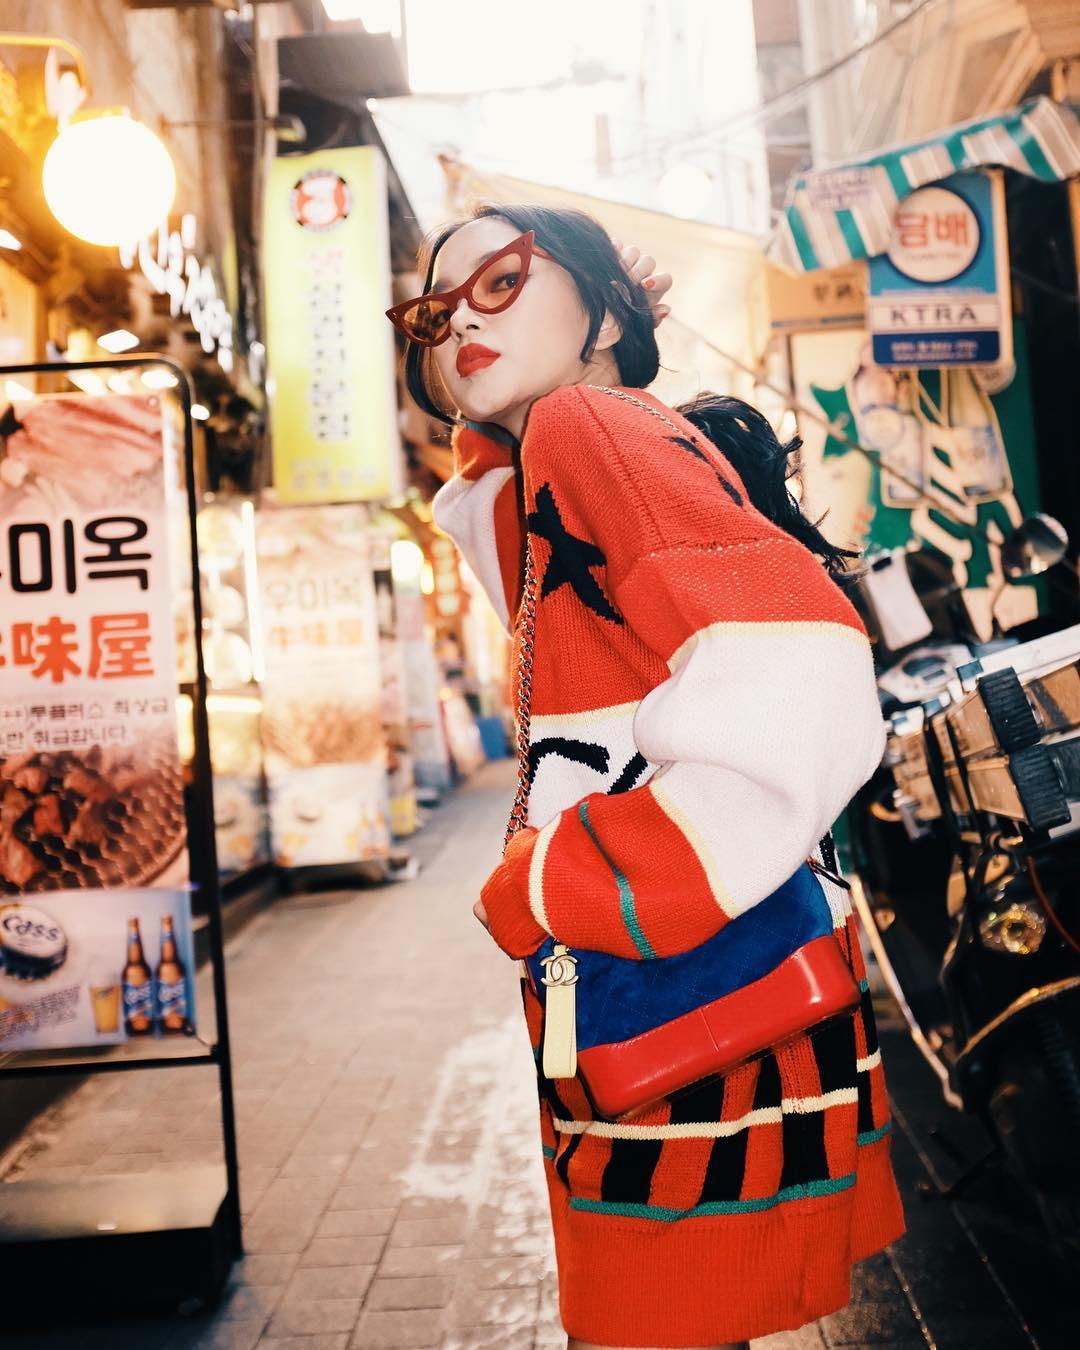 chau-bui-kinh-hoa-hang-hieu-tiet-ngam-nghia-street-style-cua-sao-viet-tai-seoul-fashion-week